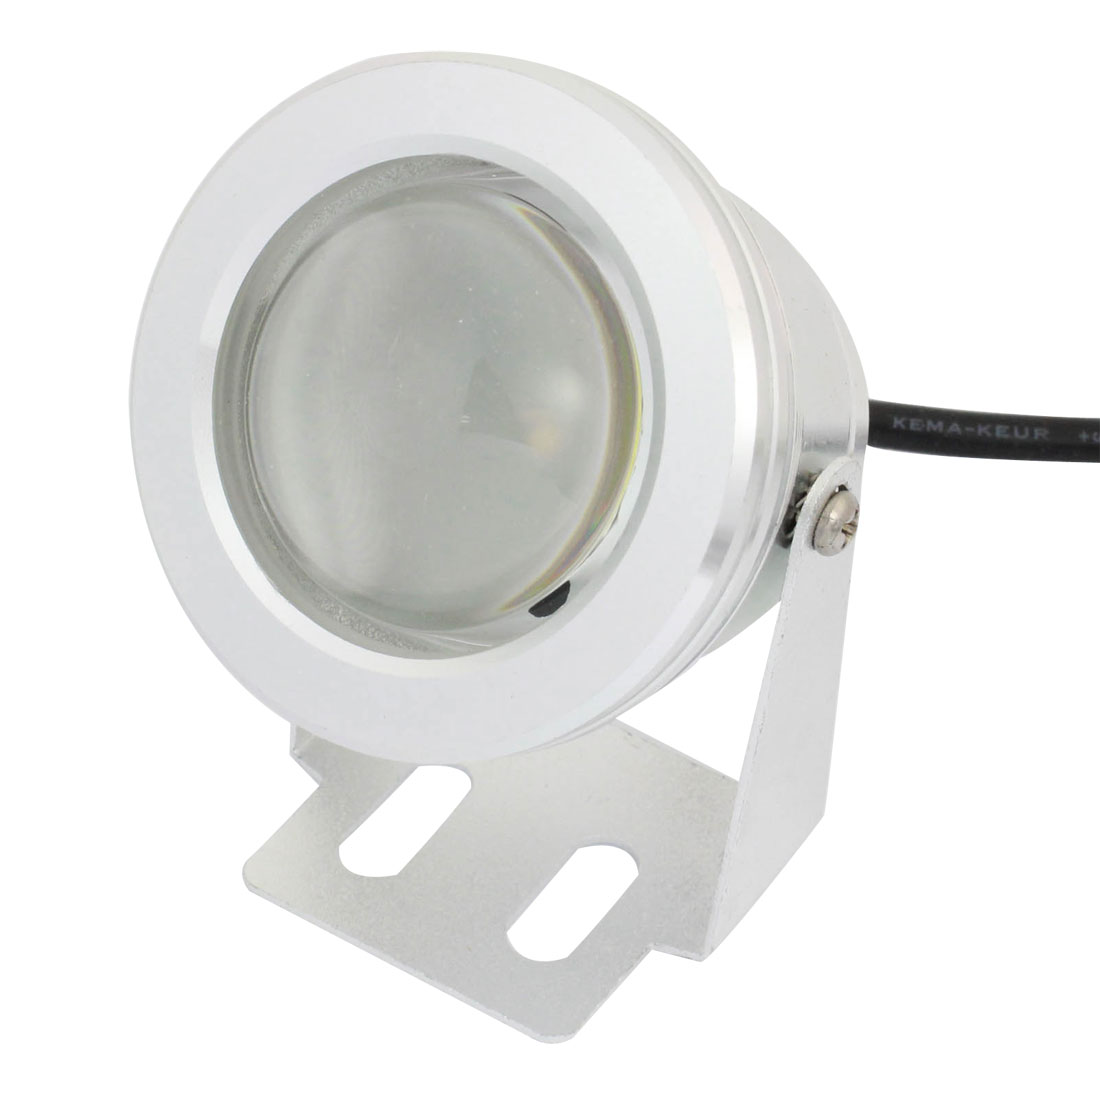 Silver Tone Shell White COB LED Spotlight Fog Lamp Light 10W for Bike Car Bicycles Boat